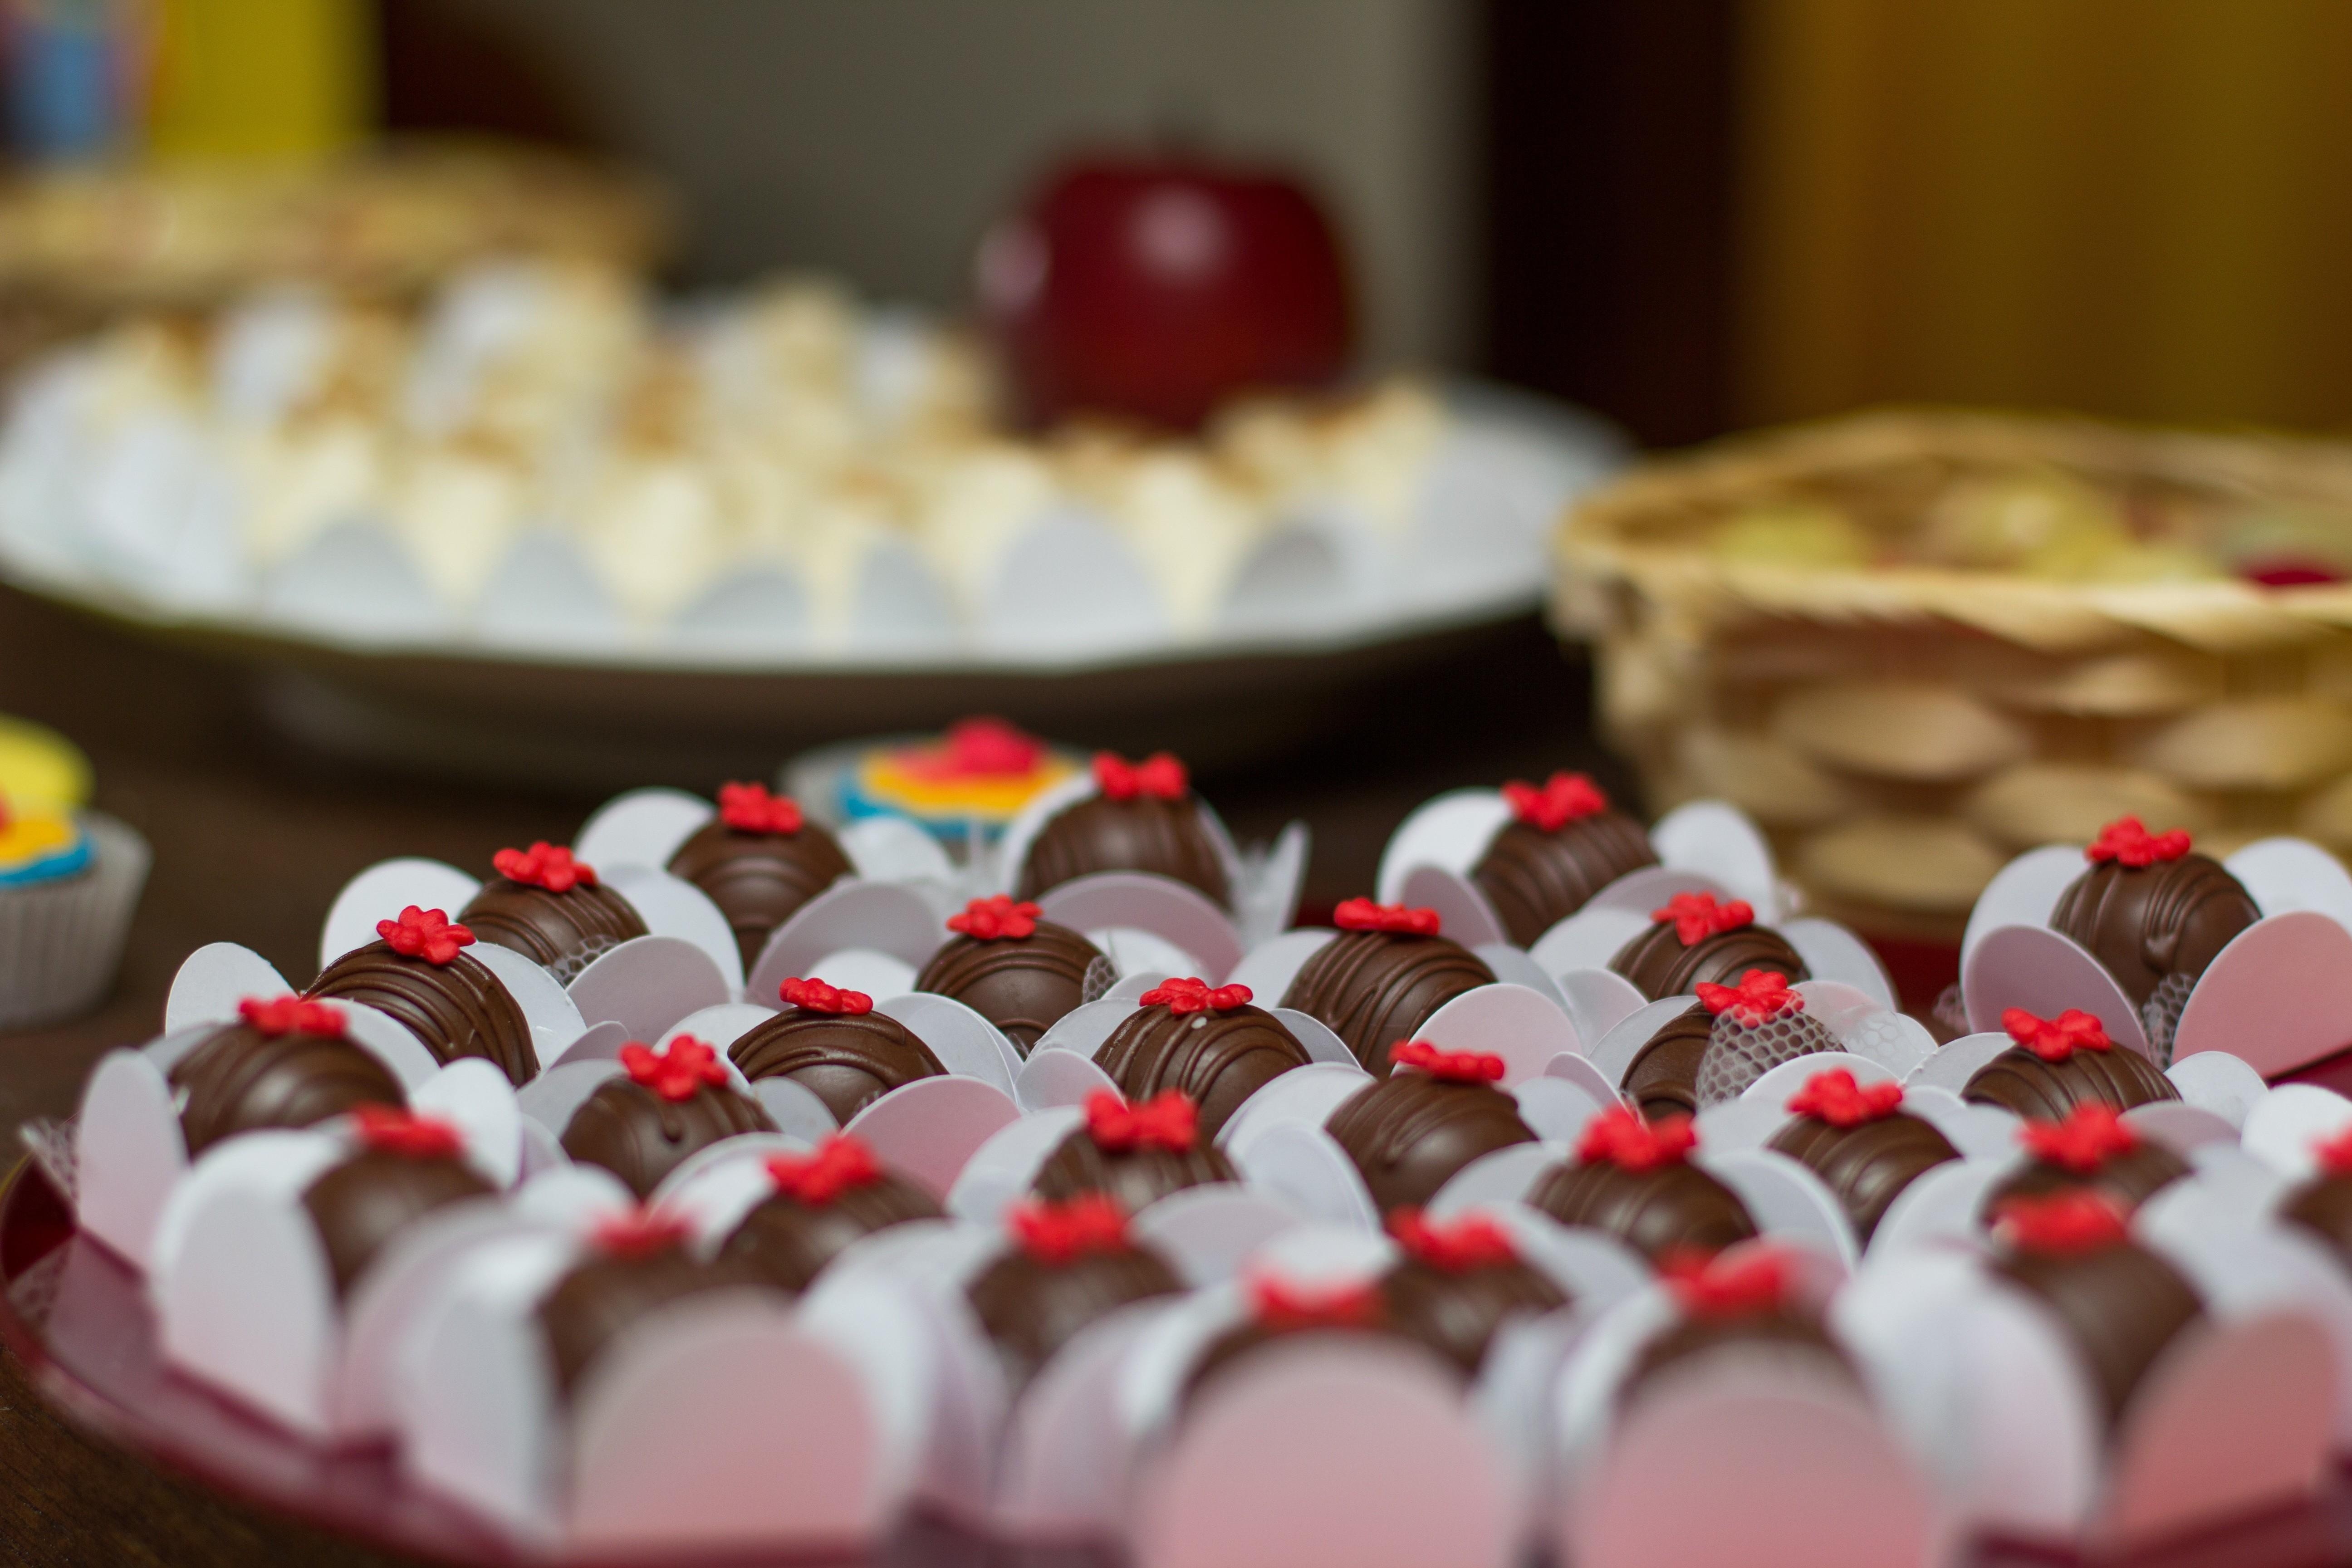 czekolada, festiwal czekolady, Amsterdam, Ekantor.pl